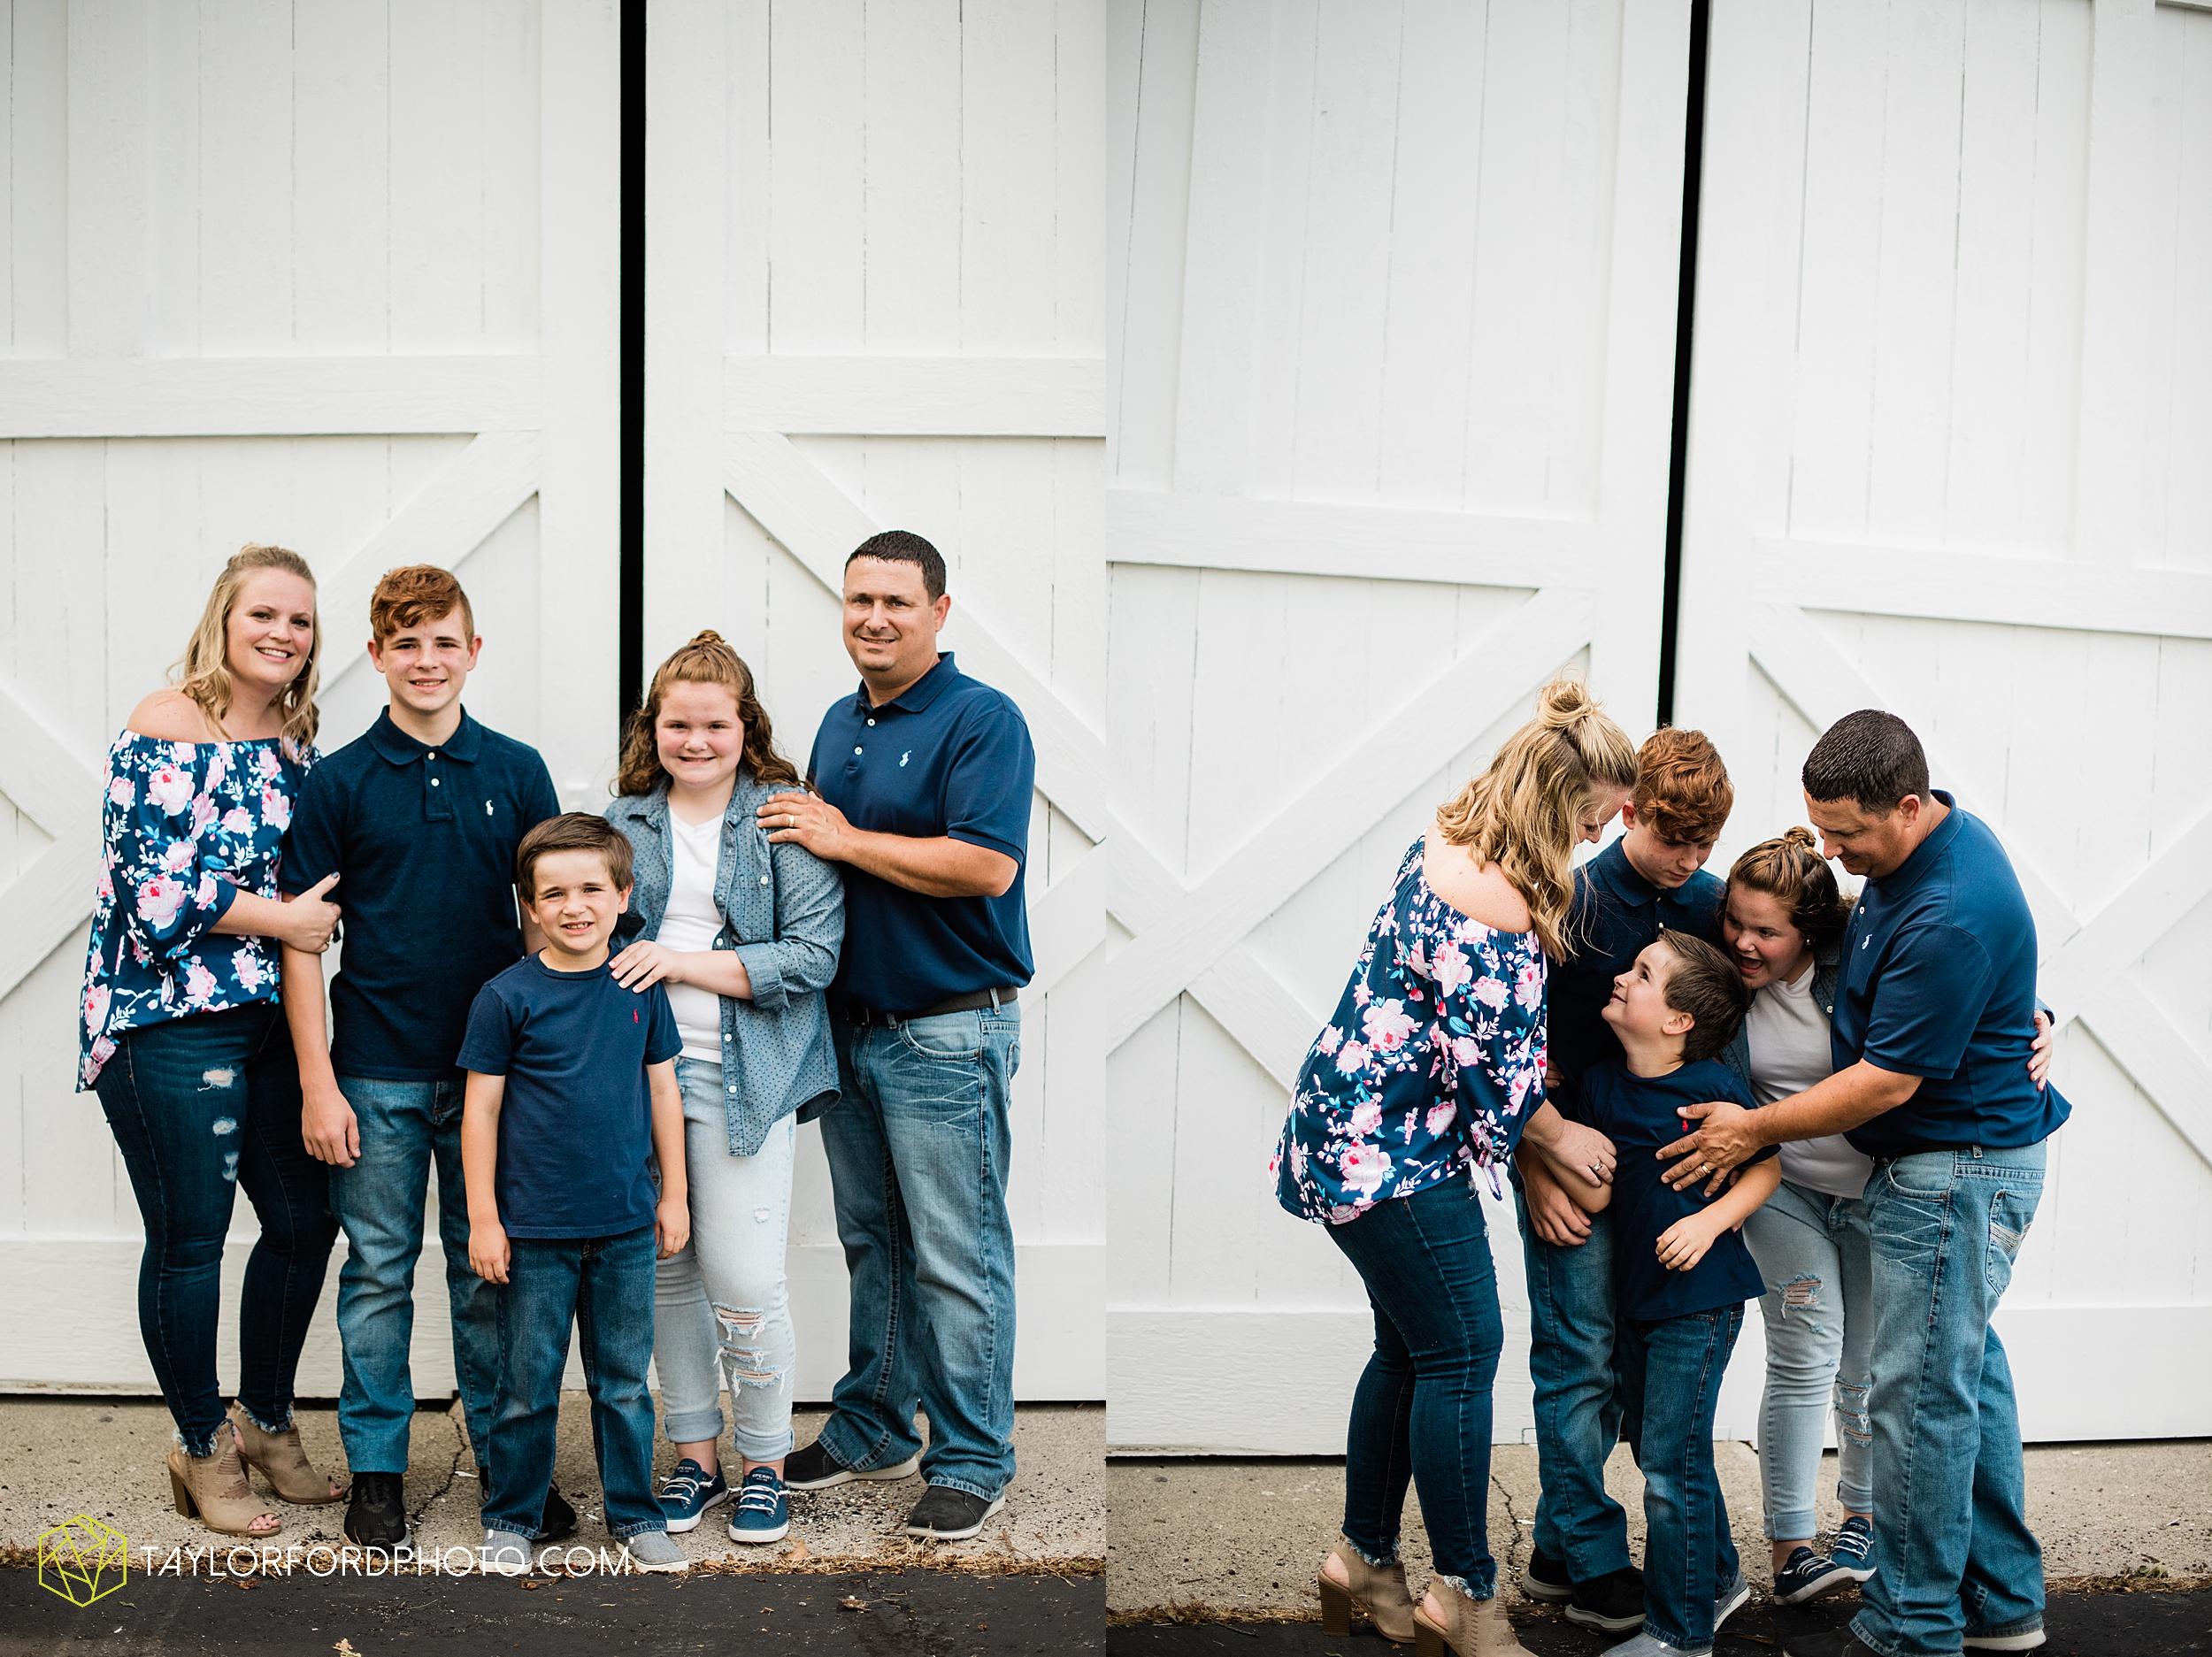 marsh-foundation-van-wert-ohio-family-photography-taylor-ford-hirschy-photographer_3612.jpg